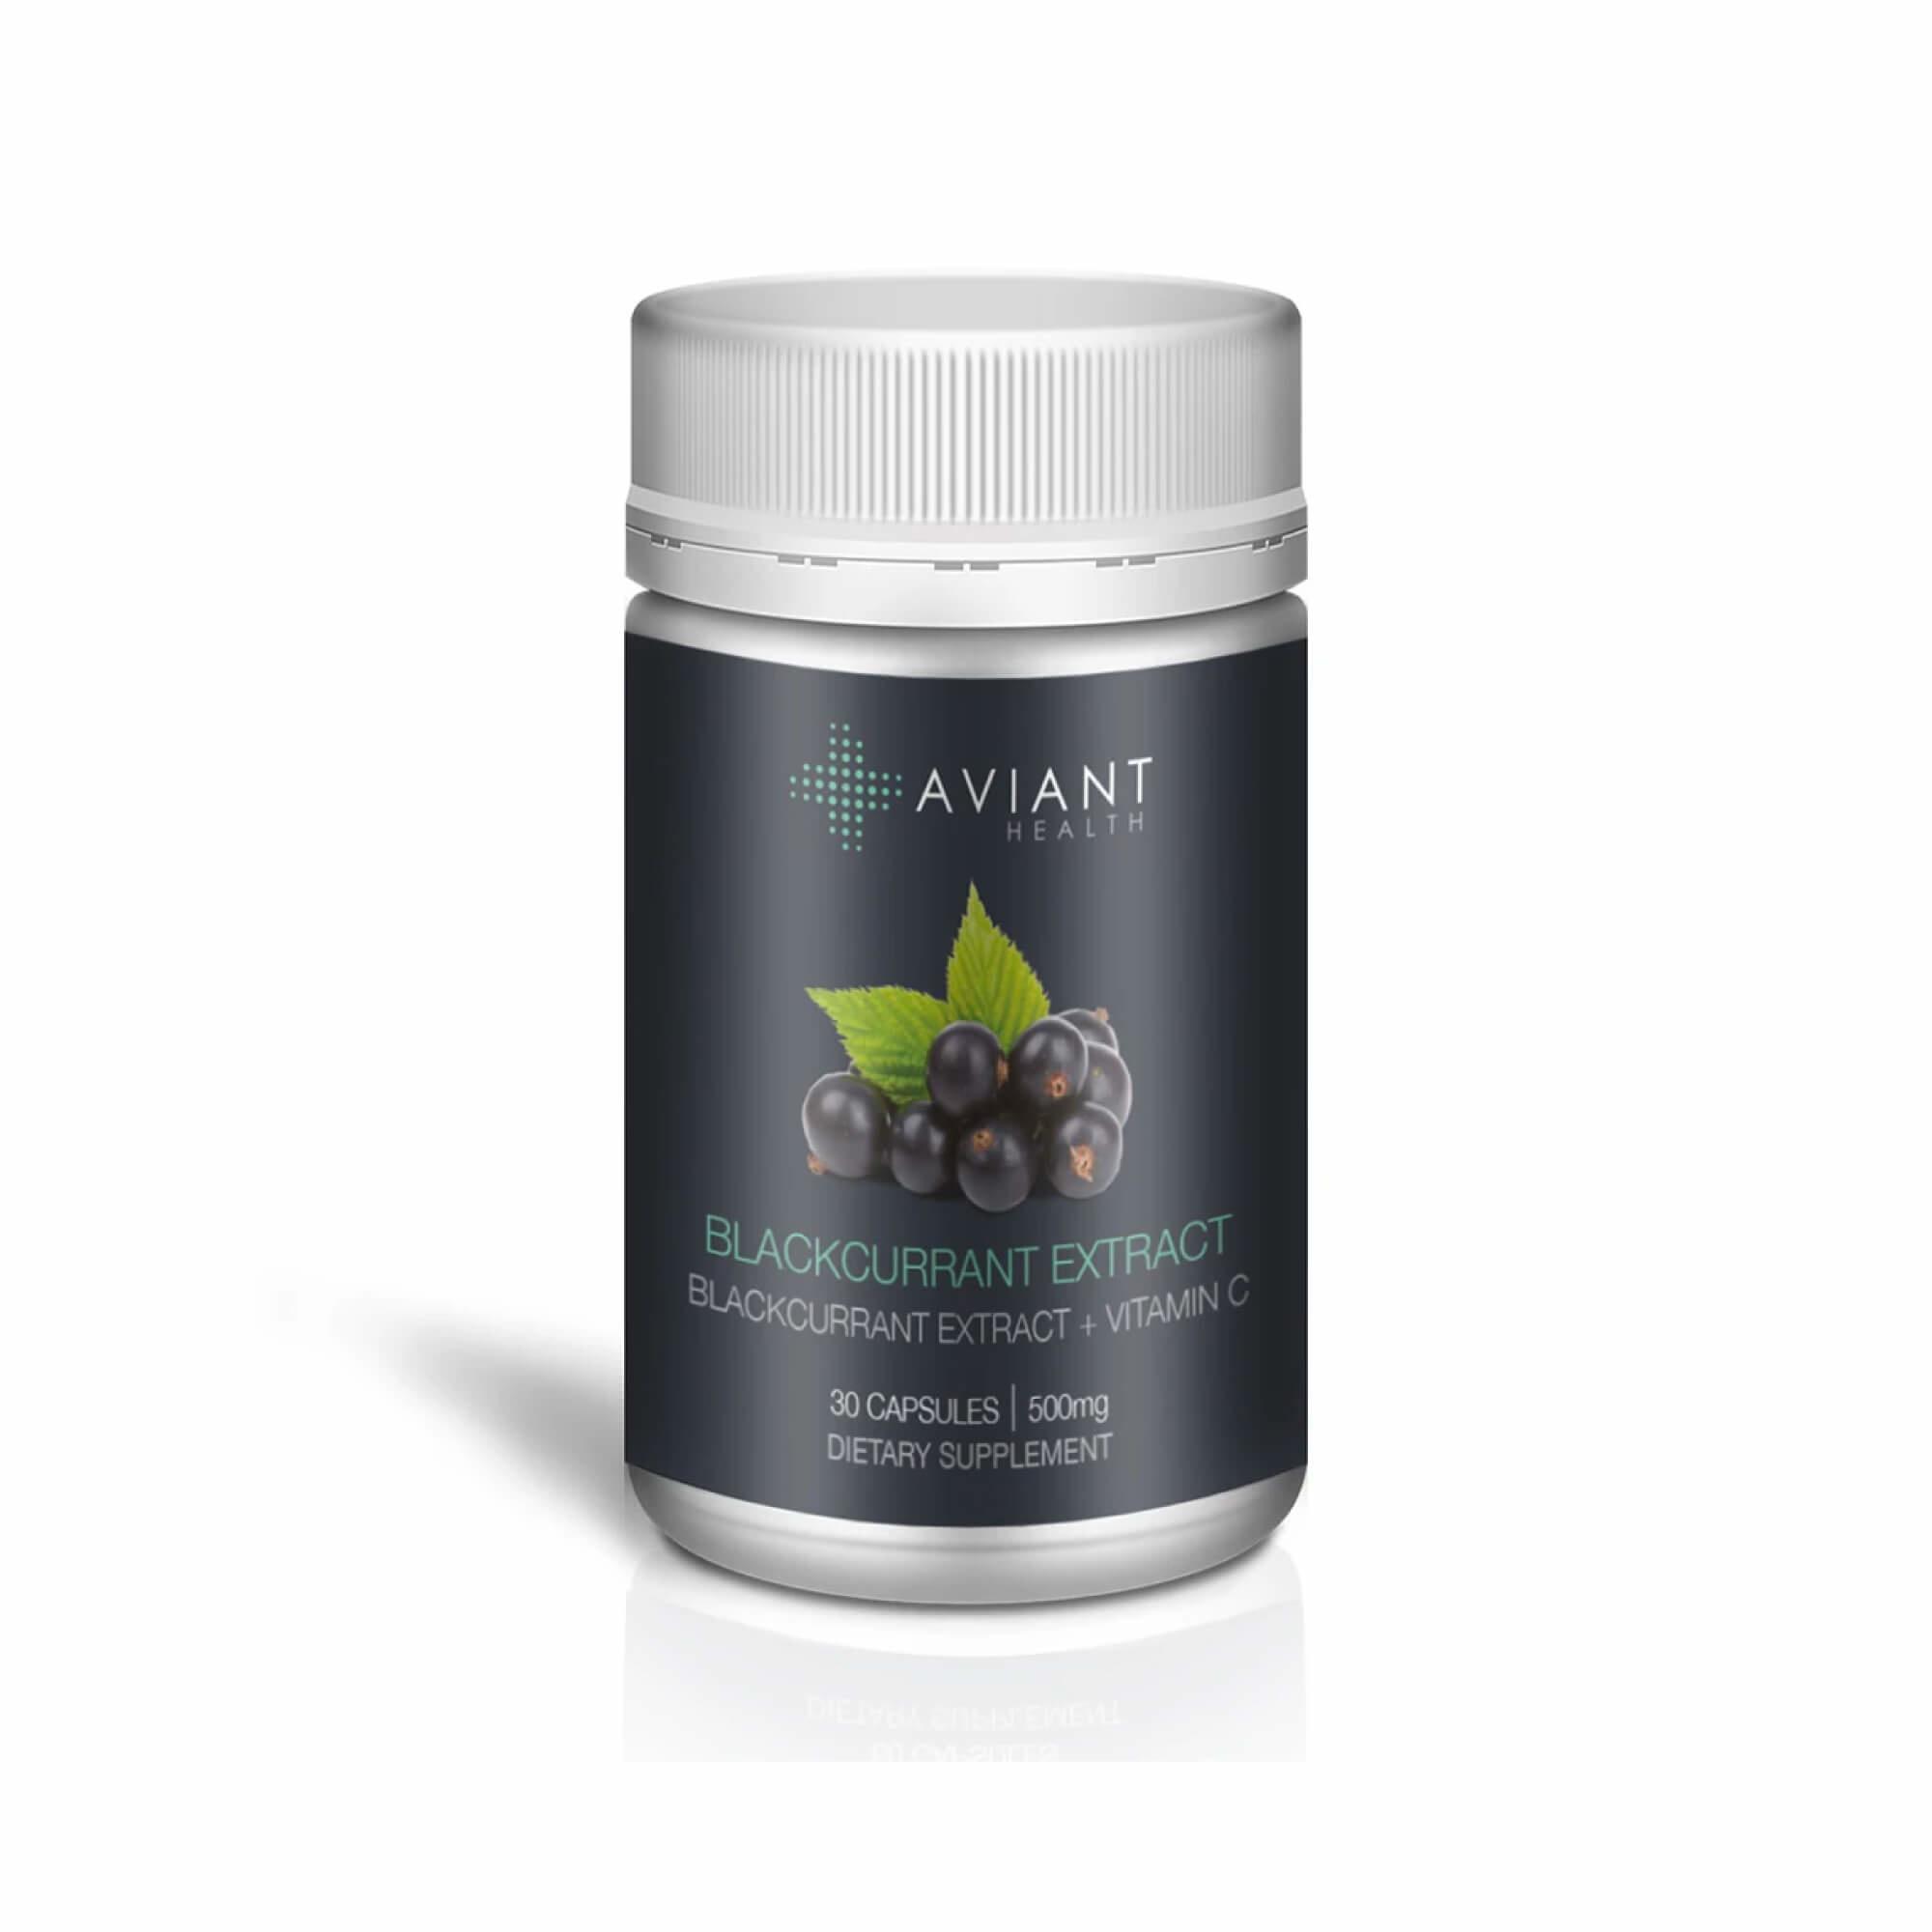 Aviant Blackcurrant Extract - 30Capsules-1